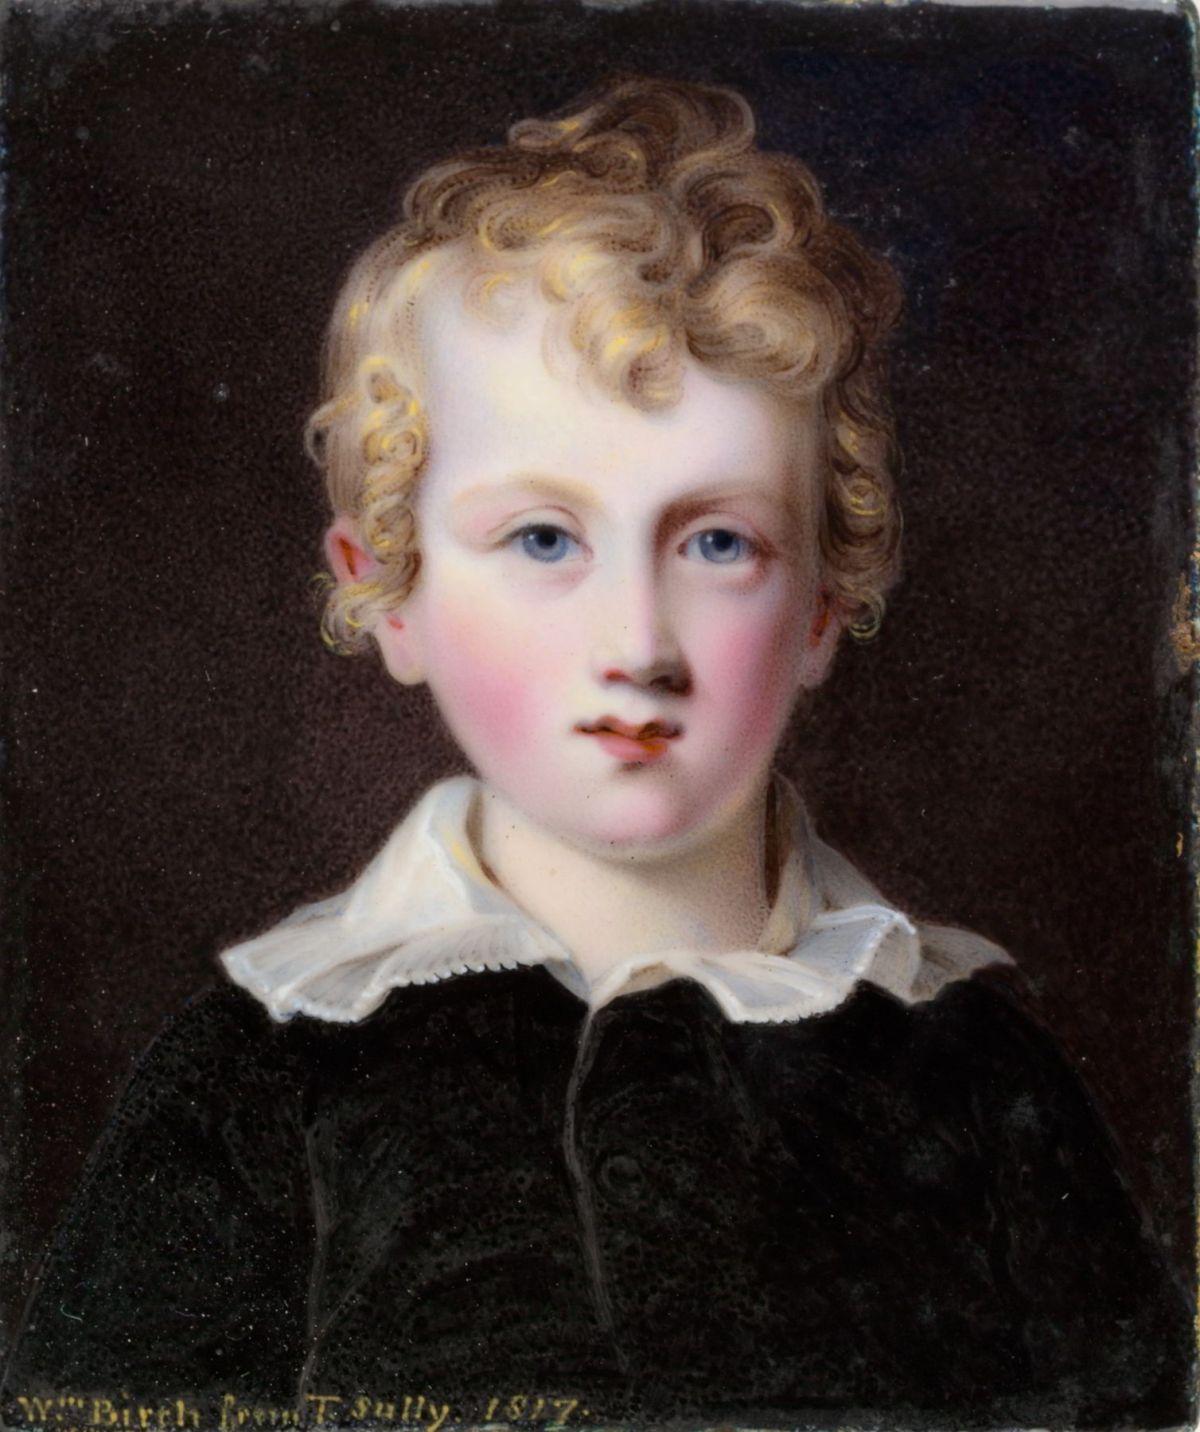 Brock Livingston by William Russell Birch